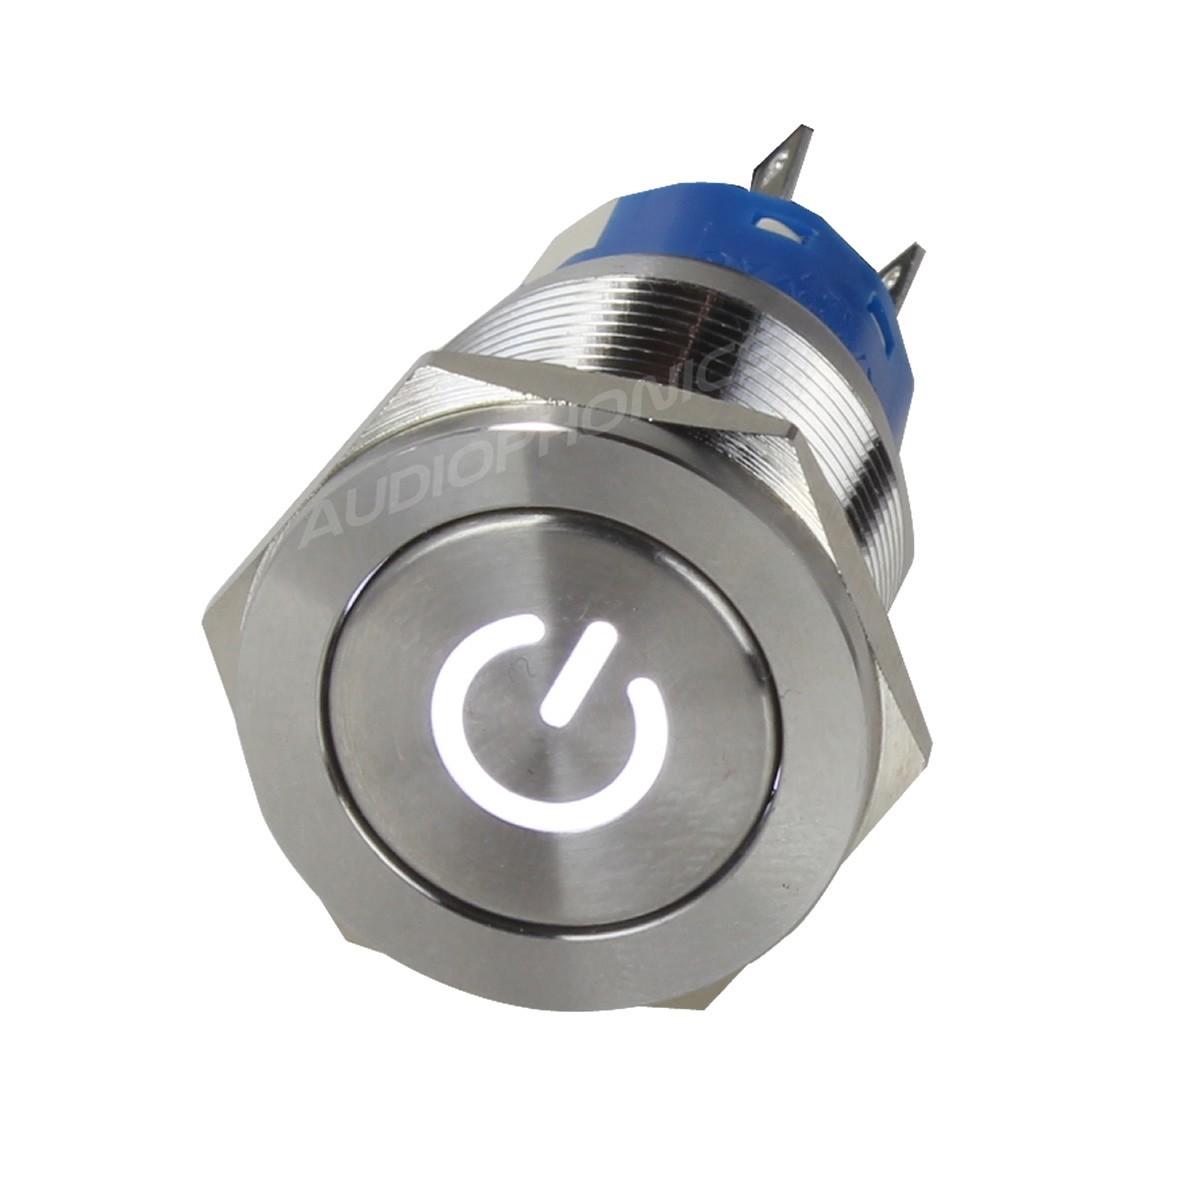 Aluminium Switch with White Power Symbol 2NO2NC 250V 5A Silver